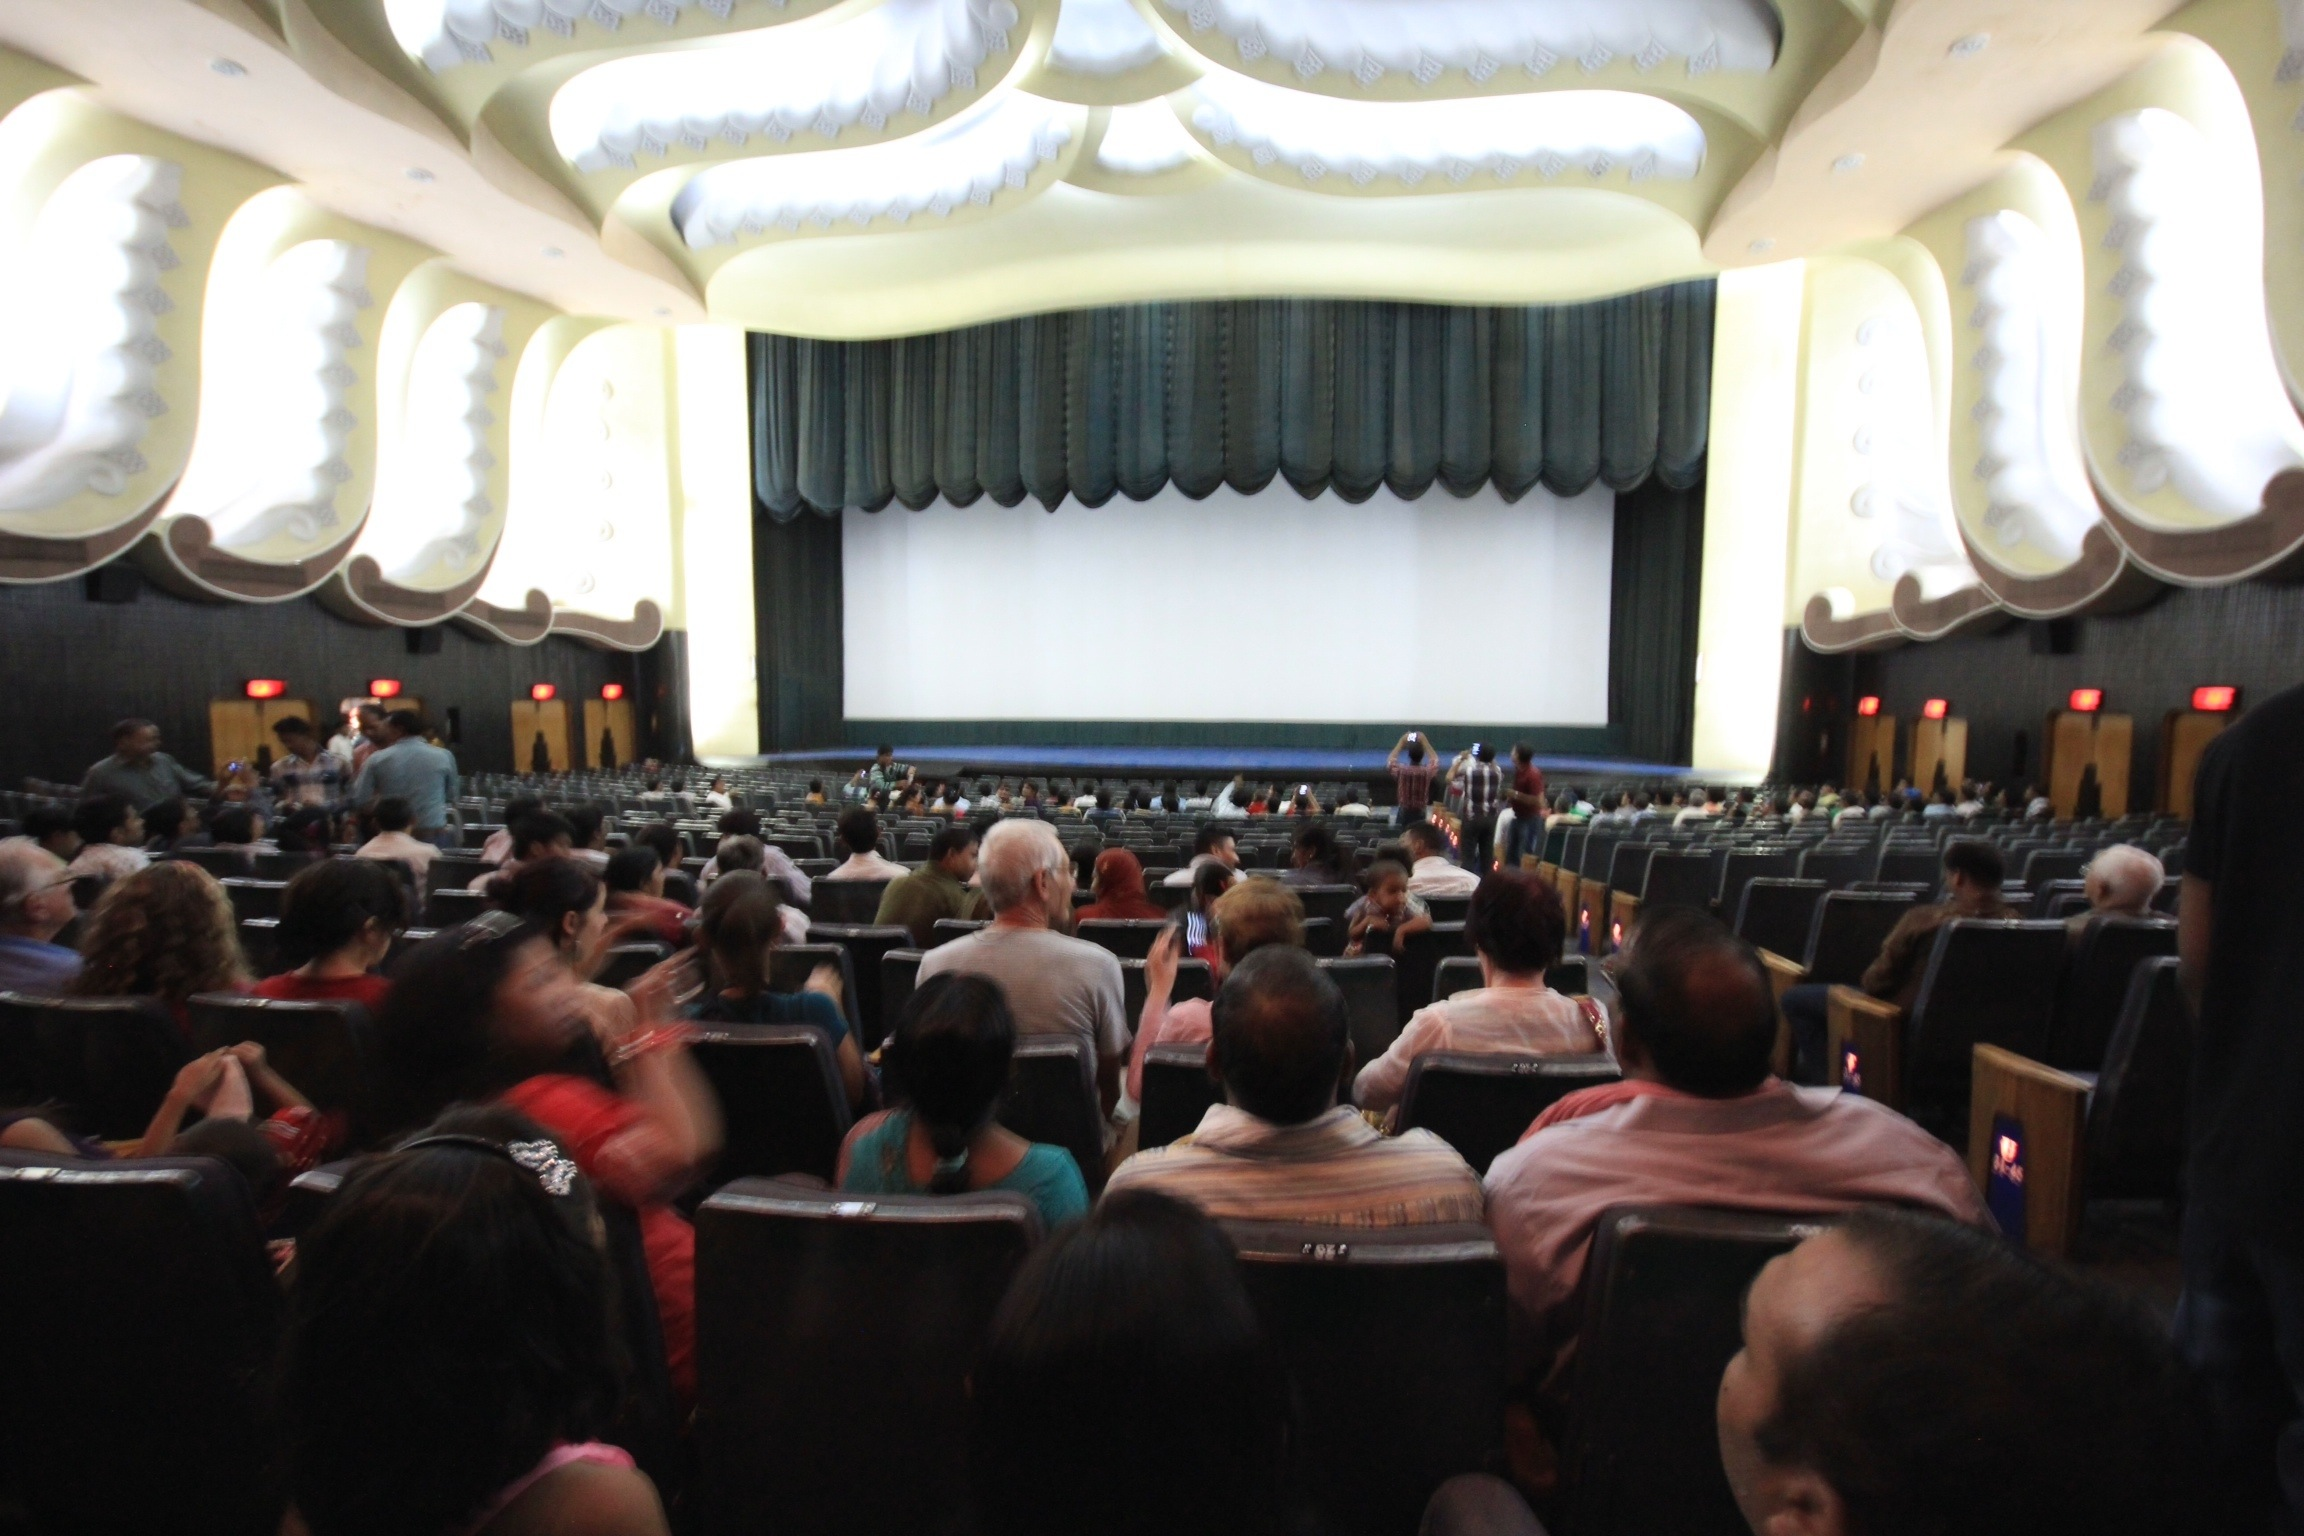 Movie night at the raj mandir 4 differences between the indian and raj mandir theater altavistaventures Images